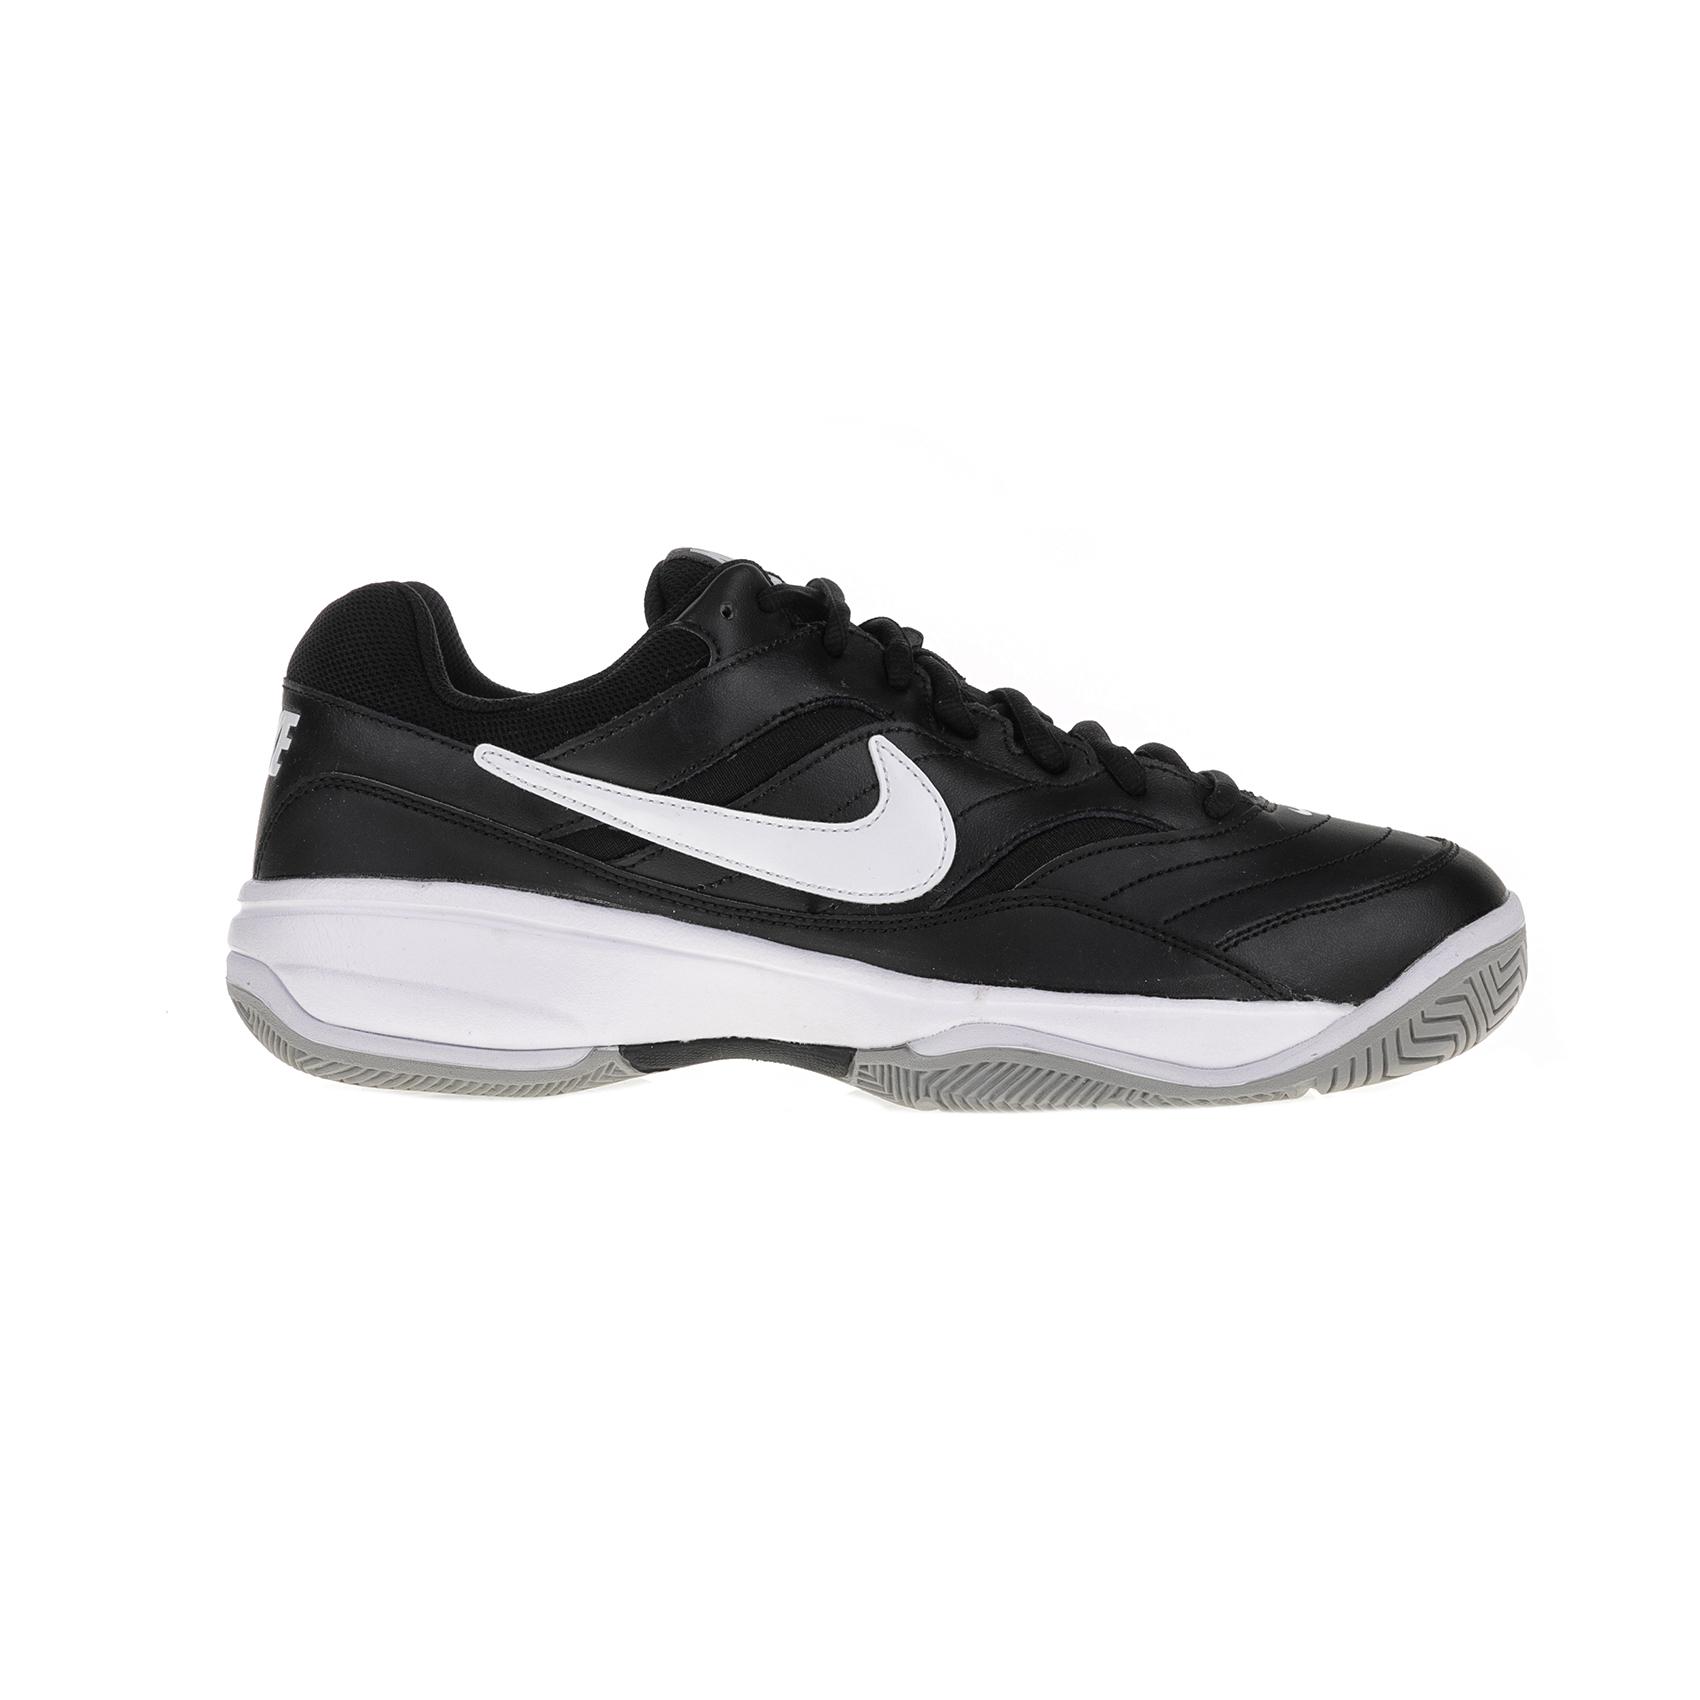 NIKE – Ανδρικά παπούτσια NIKE COURT LITE μαύρα